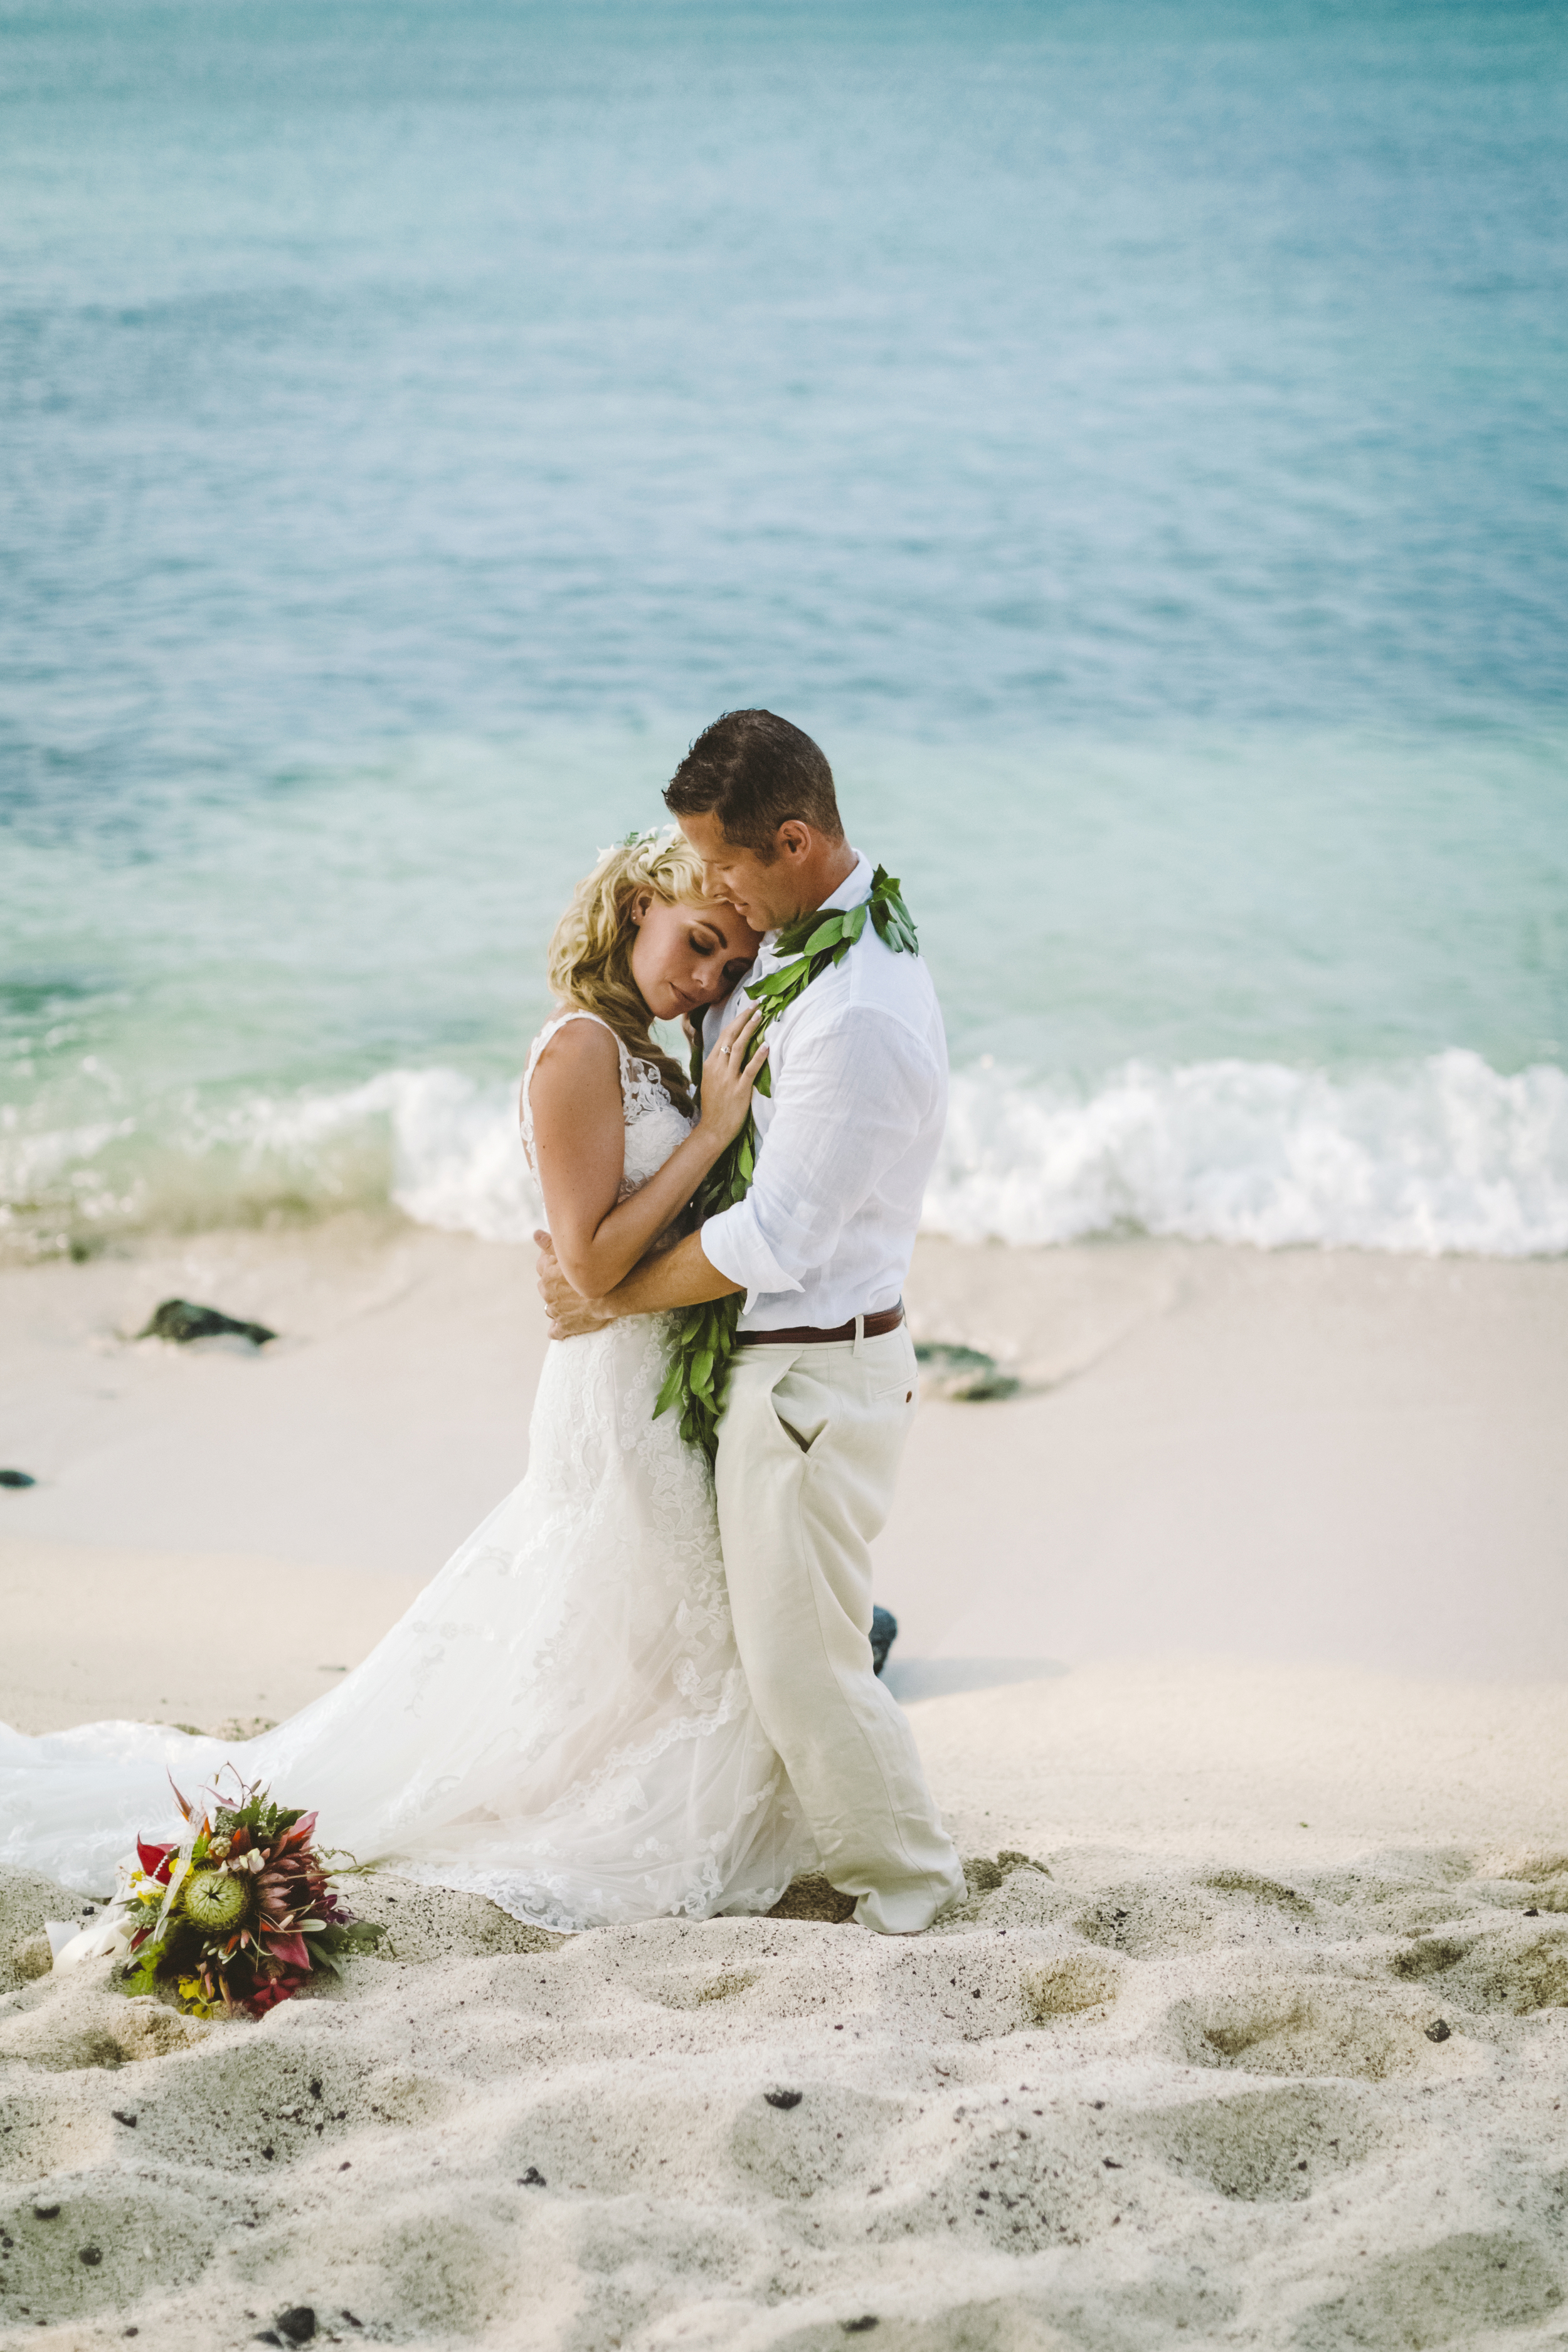 angie-diaz-photography-hawaii-wedding-photographer-kelli-jay-87.jpg